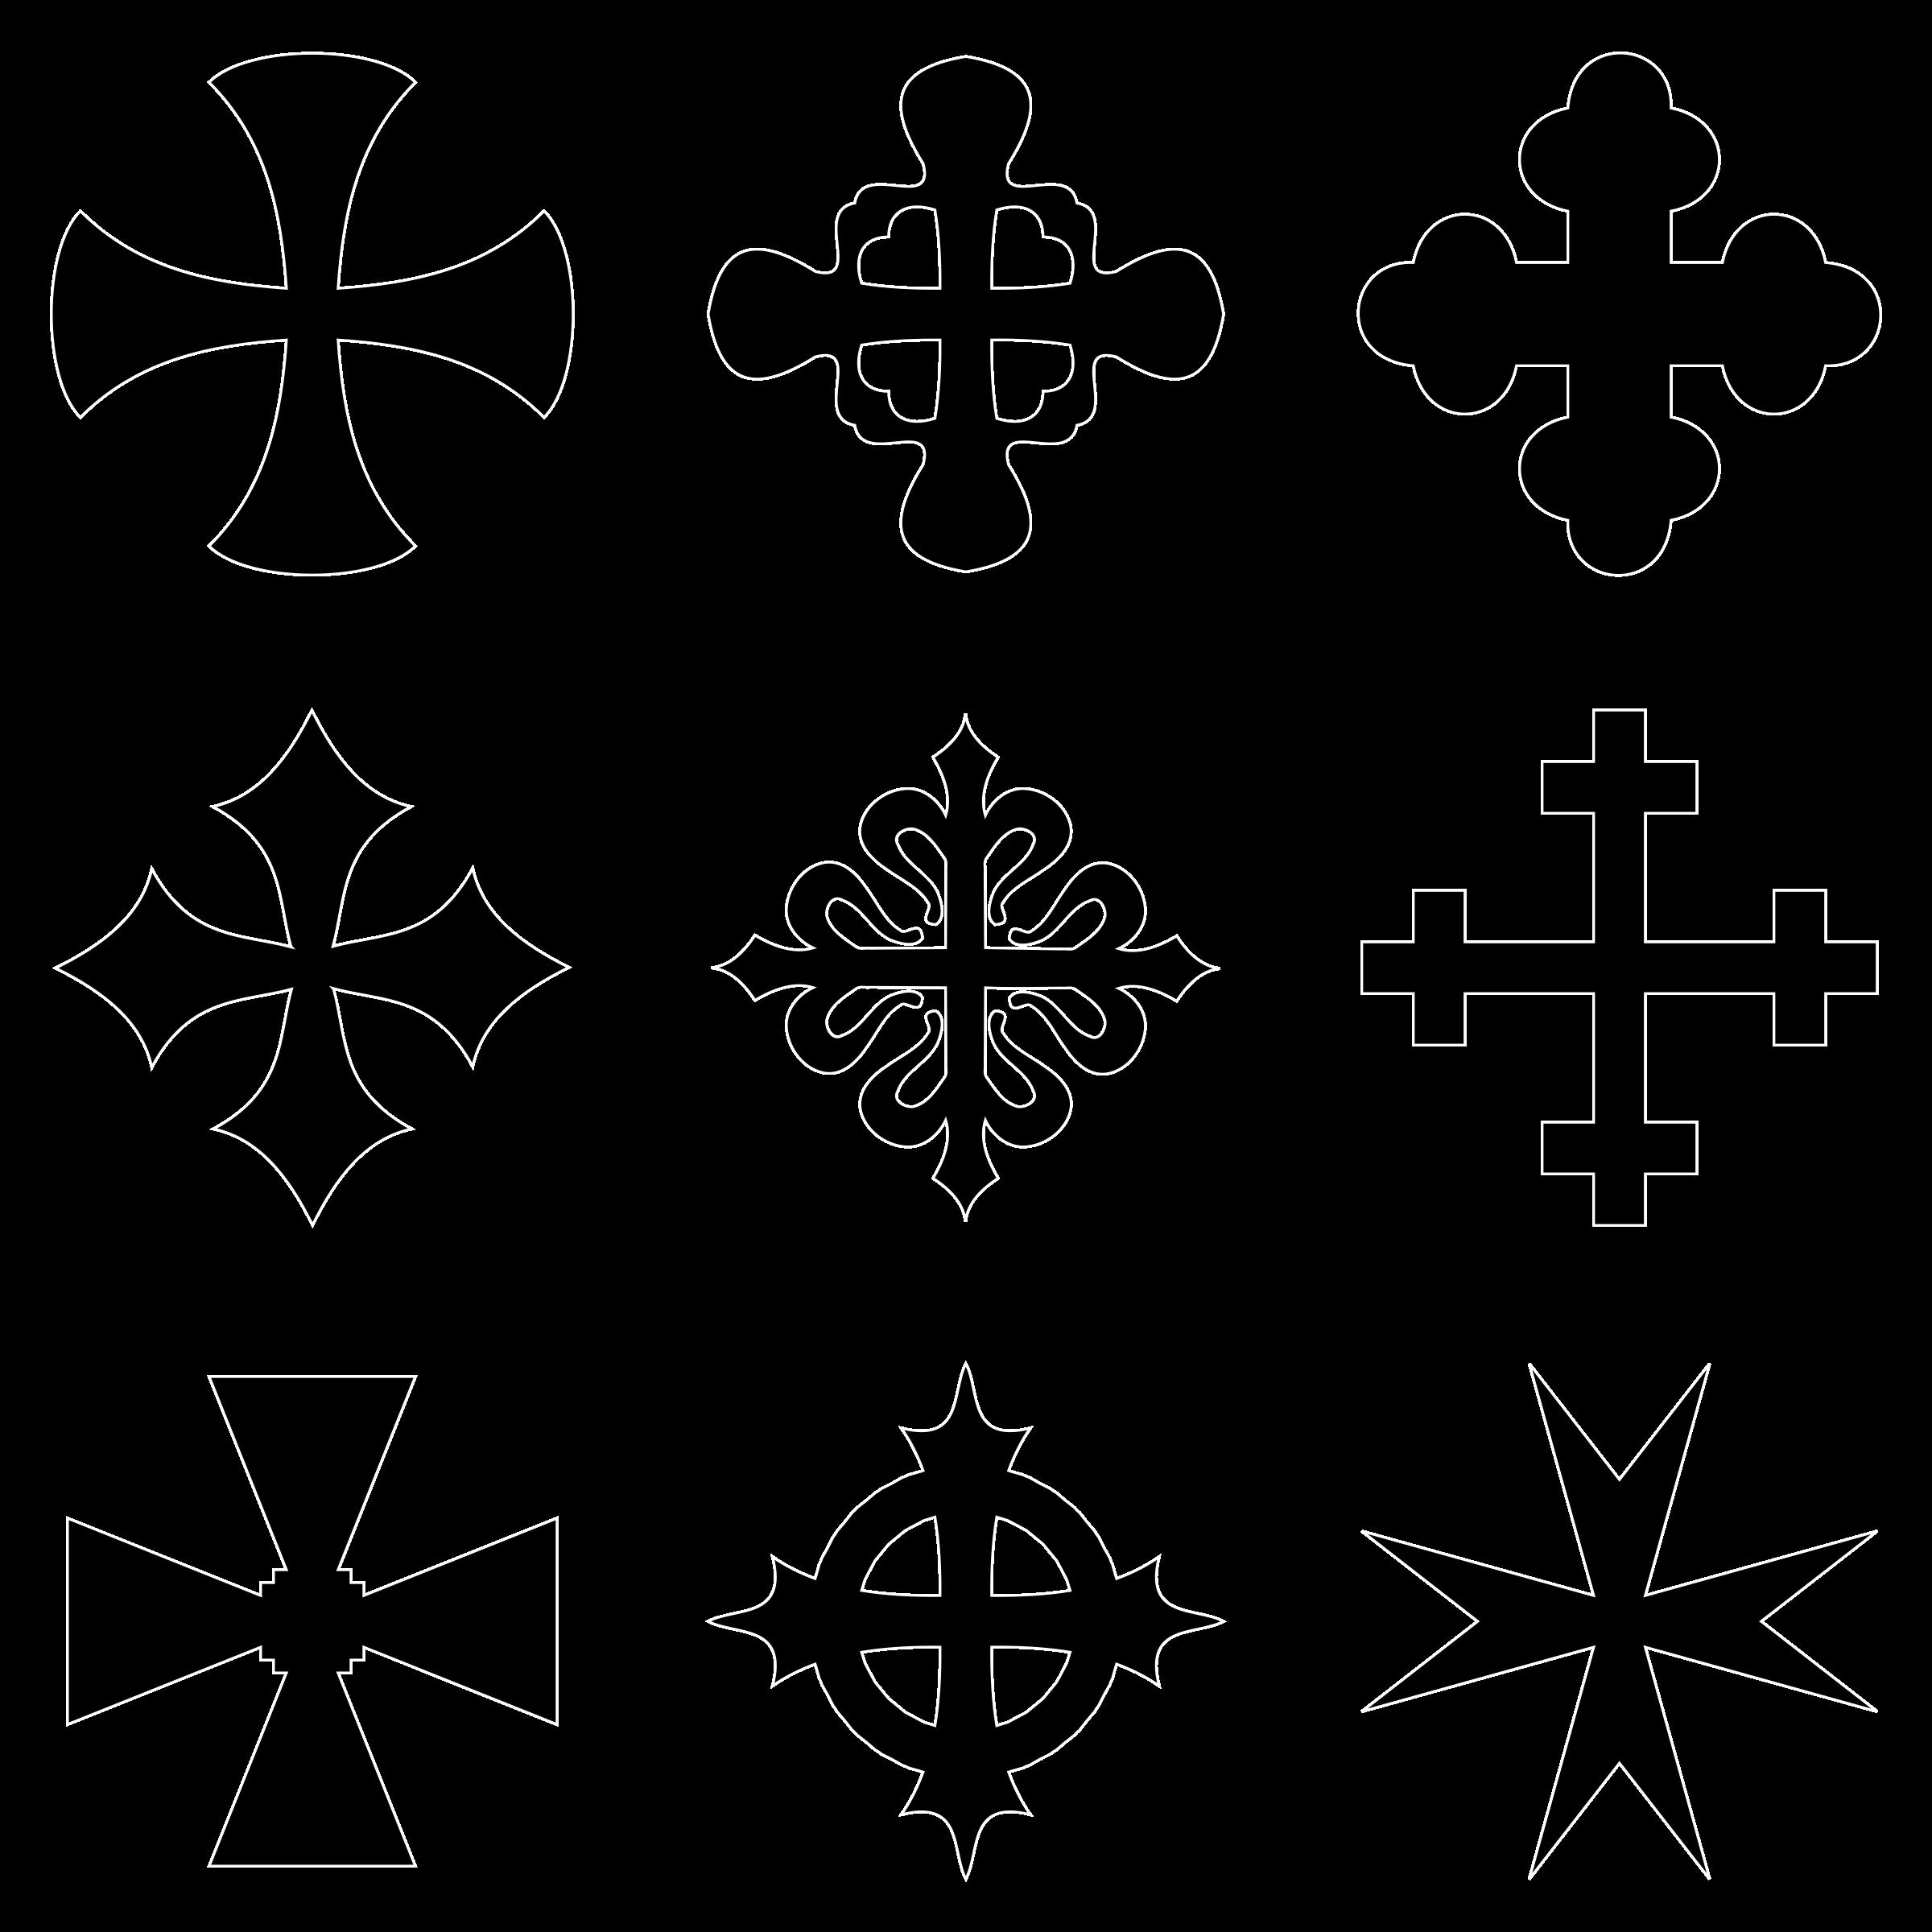 Clipart - heraldic crosses